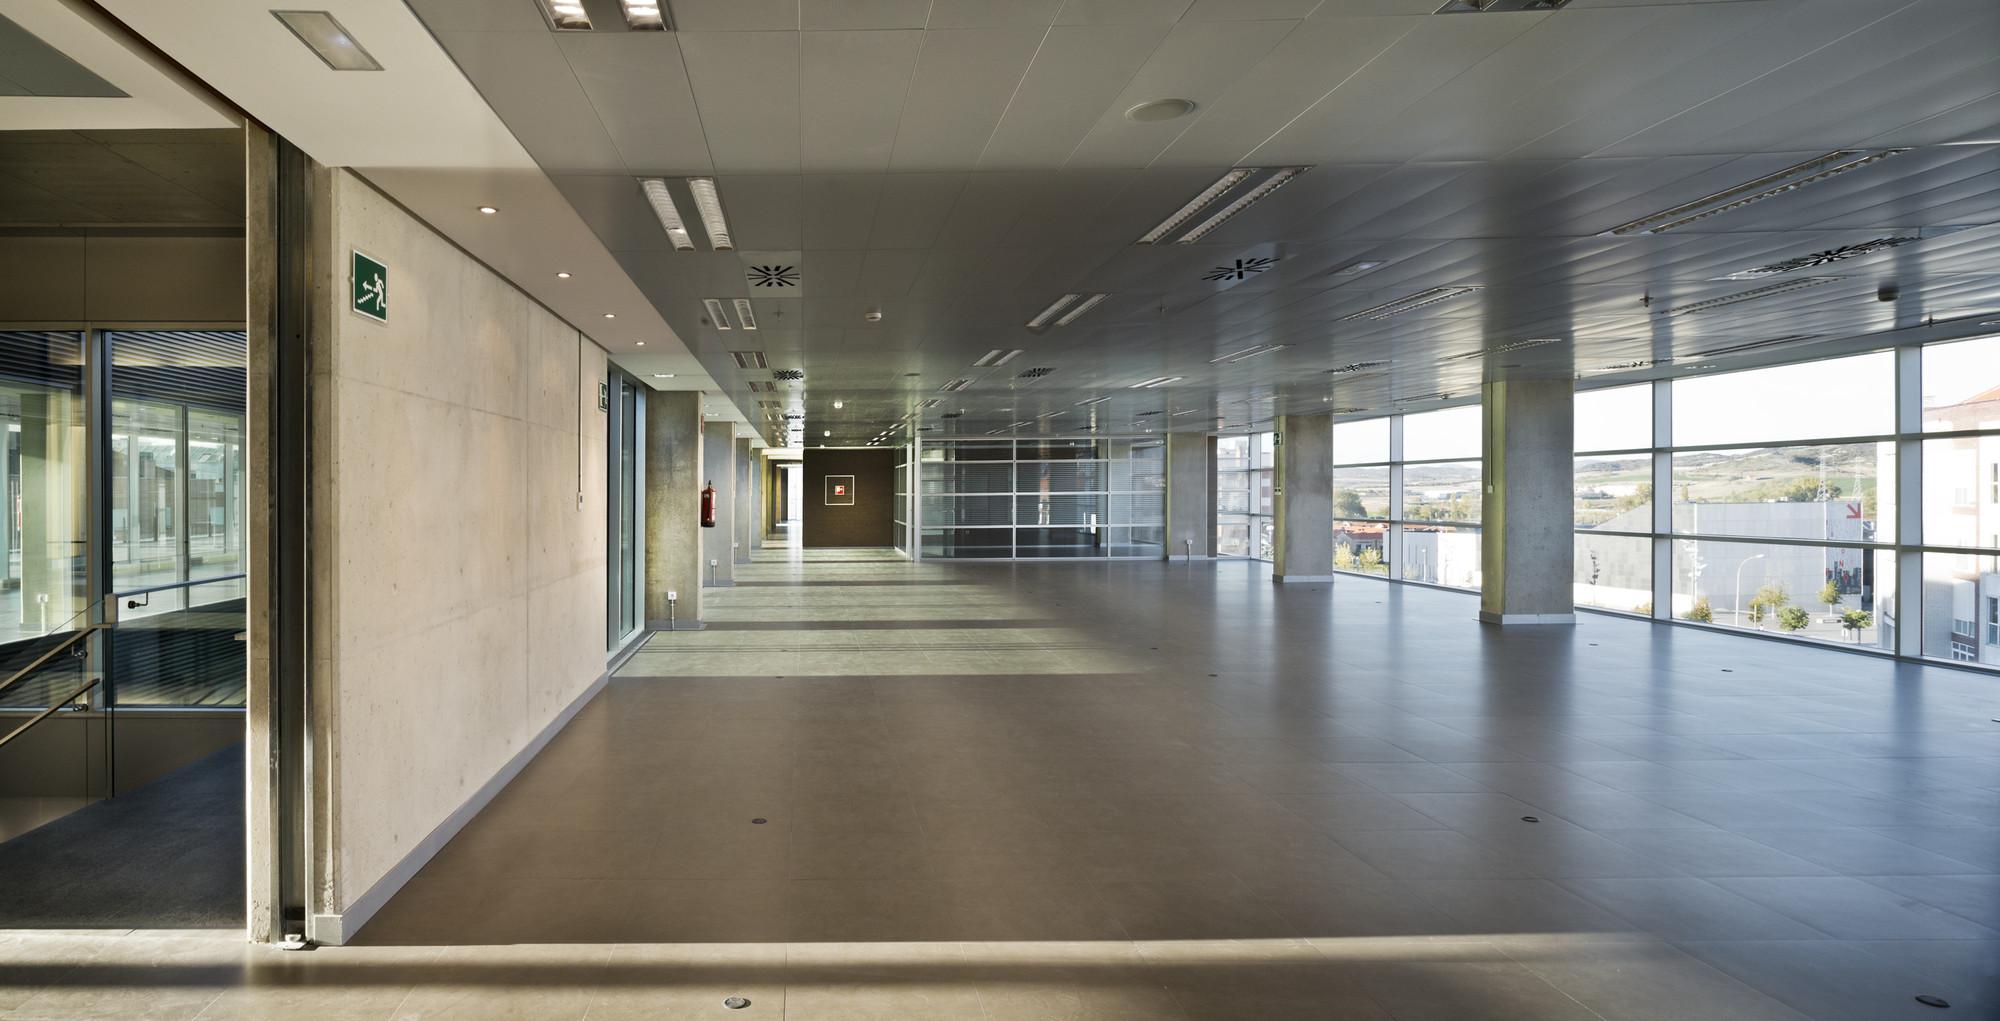 Galer a de edificio de oficinas en vitoria lh14 arquitectos 9 - Arquitectos en vitoria ...